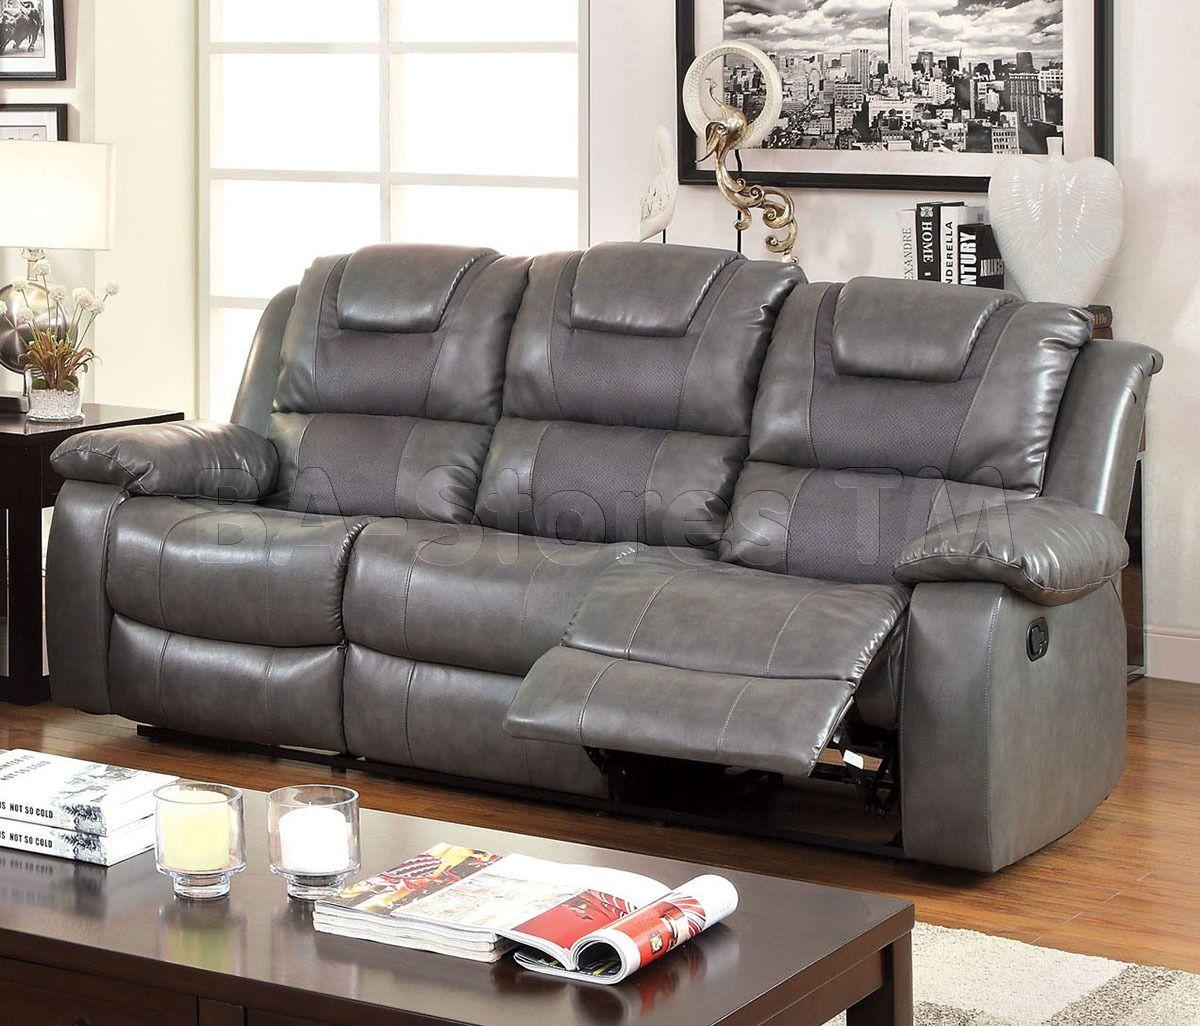 Grandolf Reclining Sofa in Grey by Furniture of America